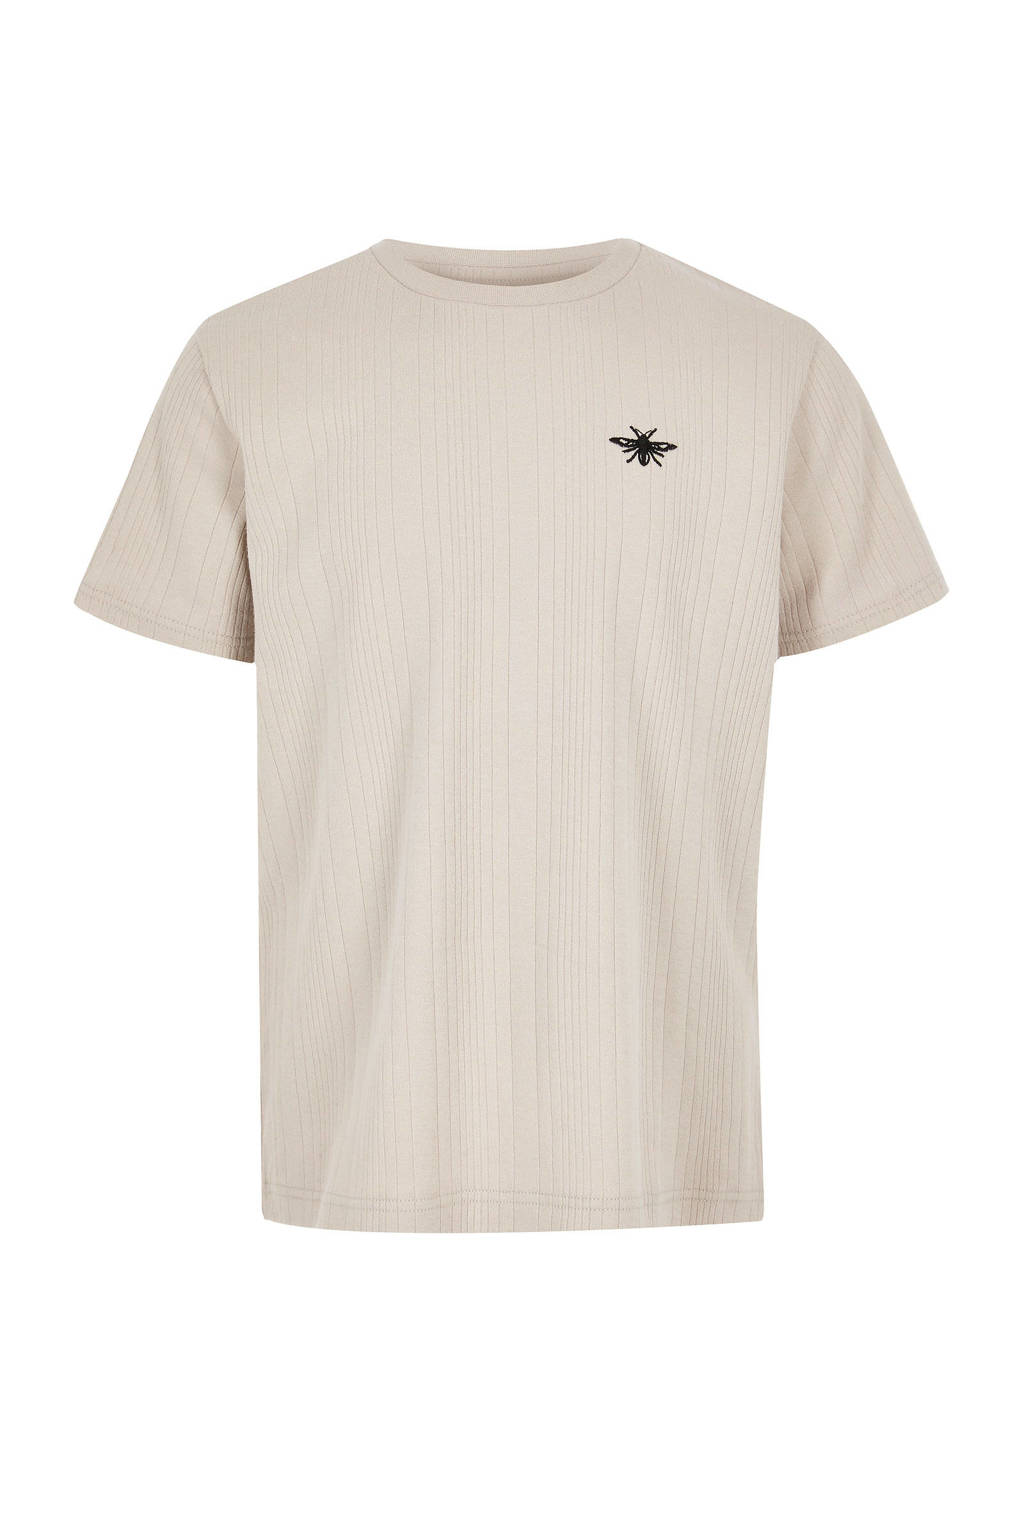 River Island T-shirt met borduursels ecru, Ecru